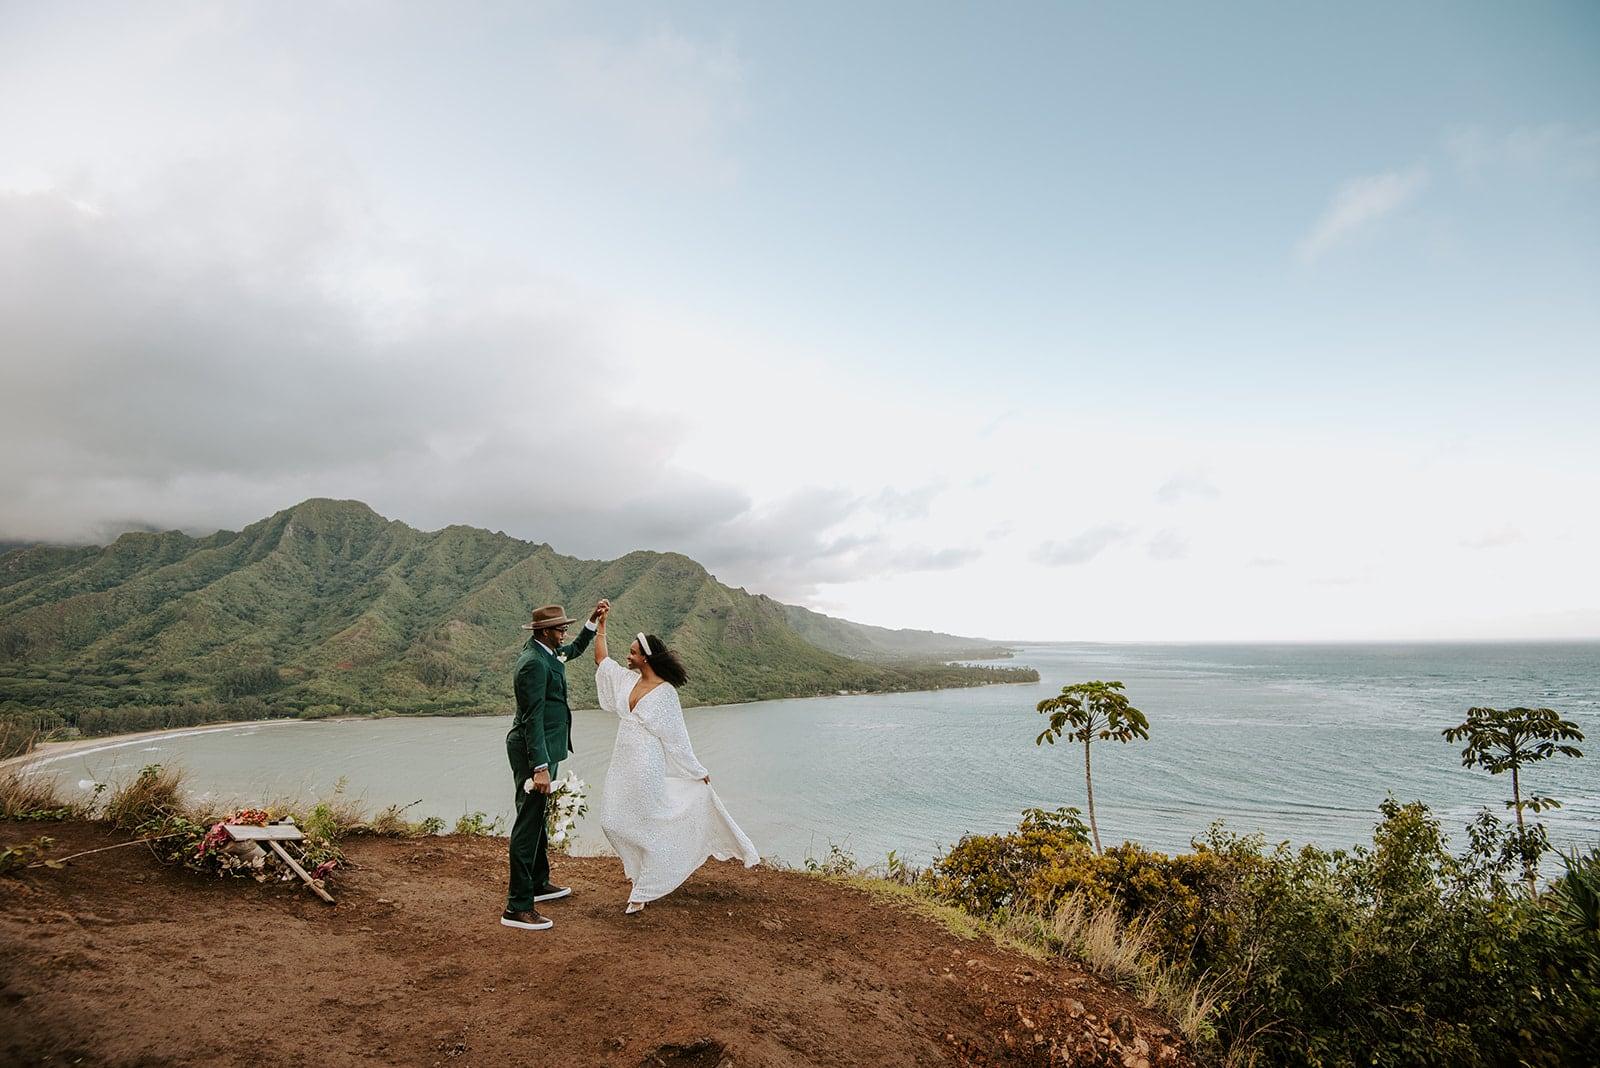 couple eloping in hawaii